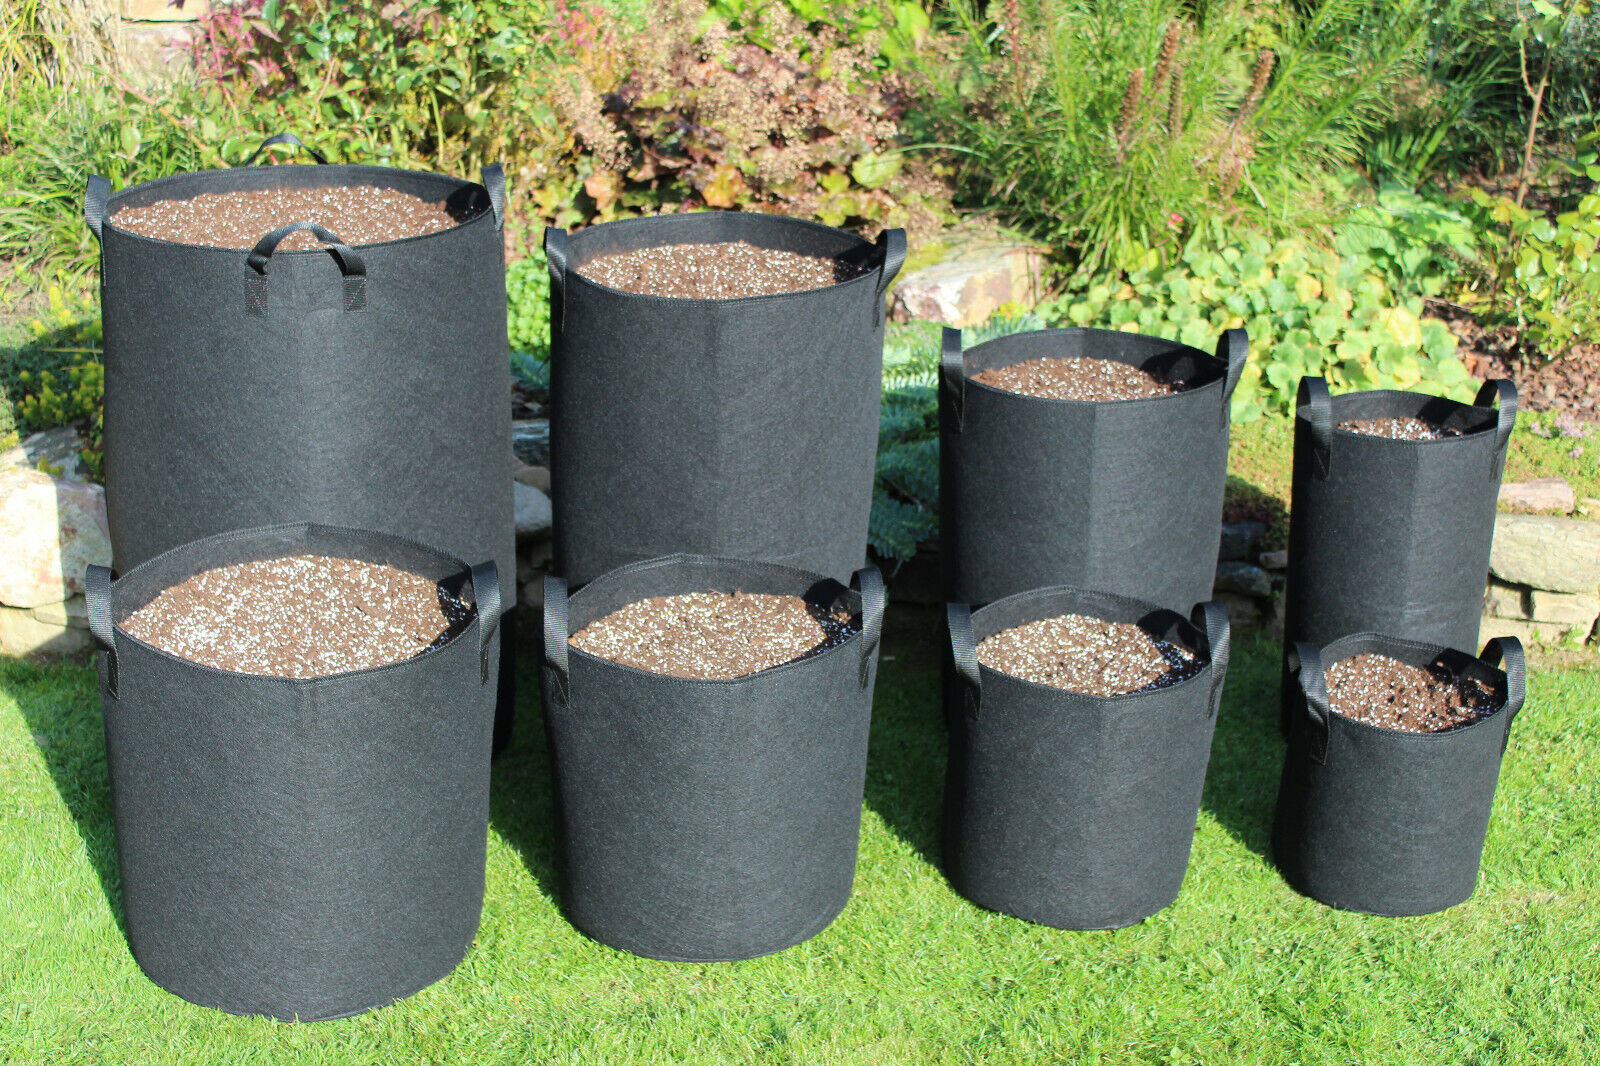 Pflanzsäcke mit Henkeln Pflanztasche Grow Bag Plant Bags Pflanzsack 12 - 450l